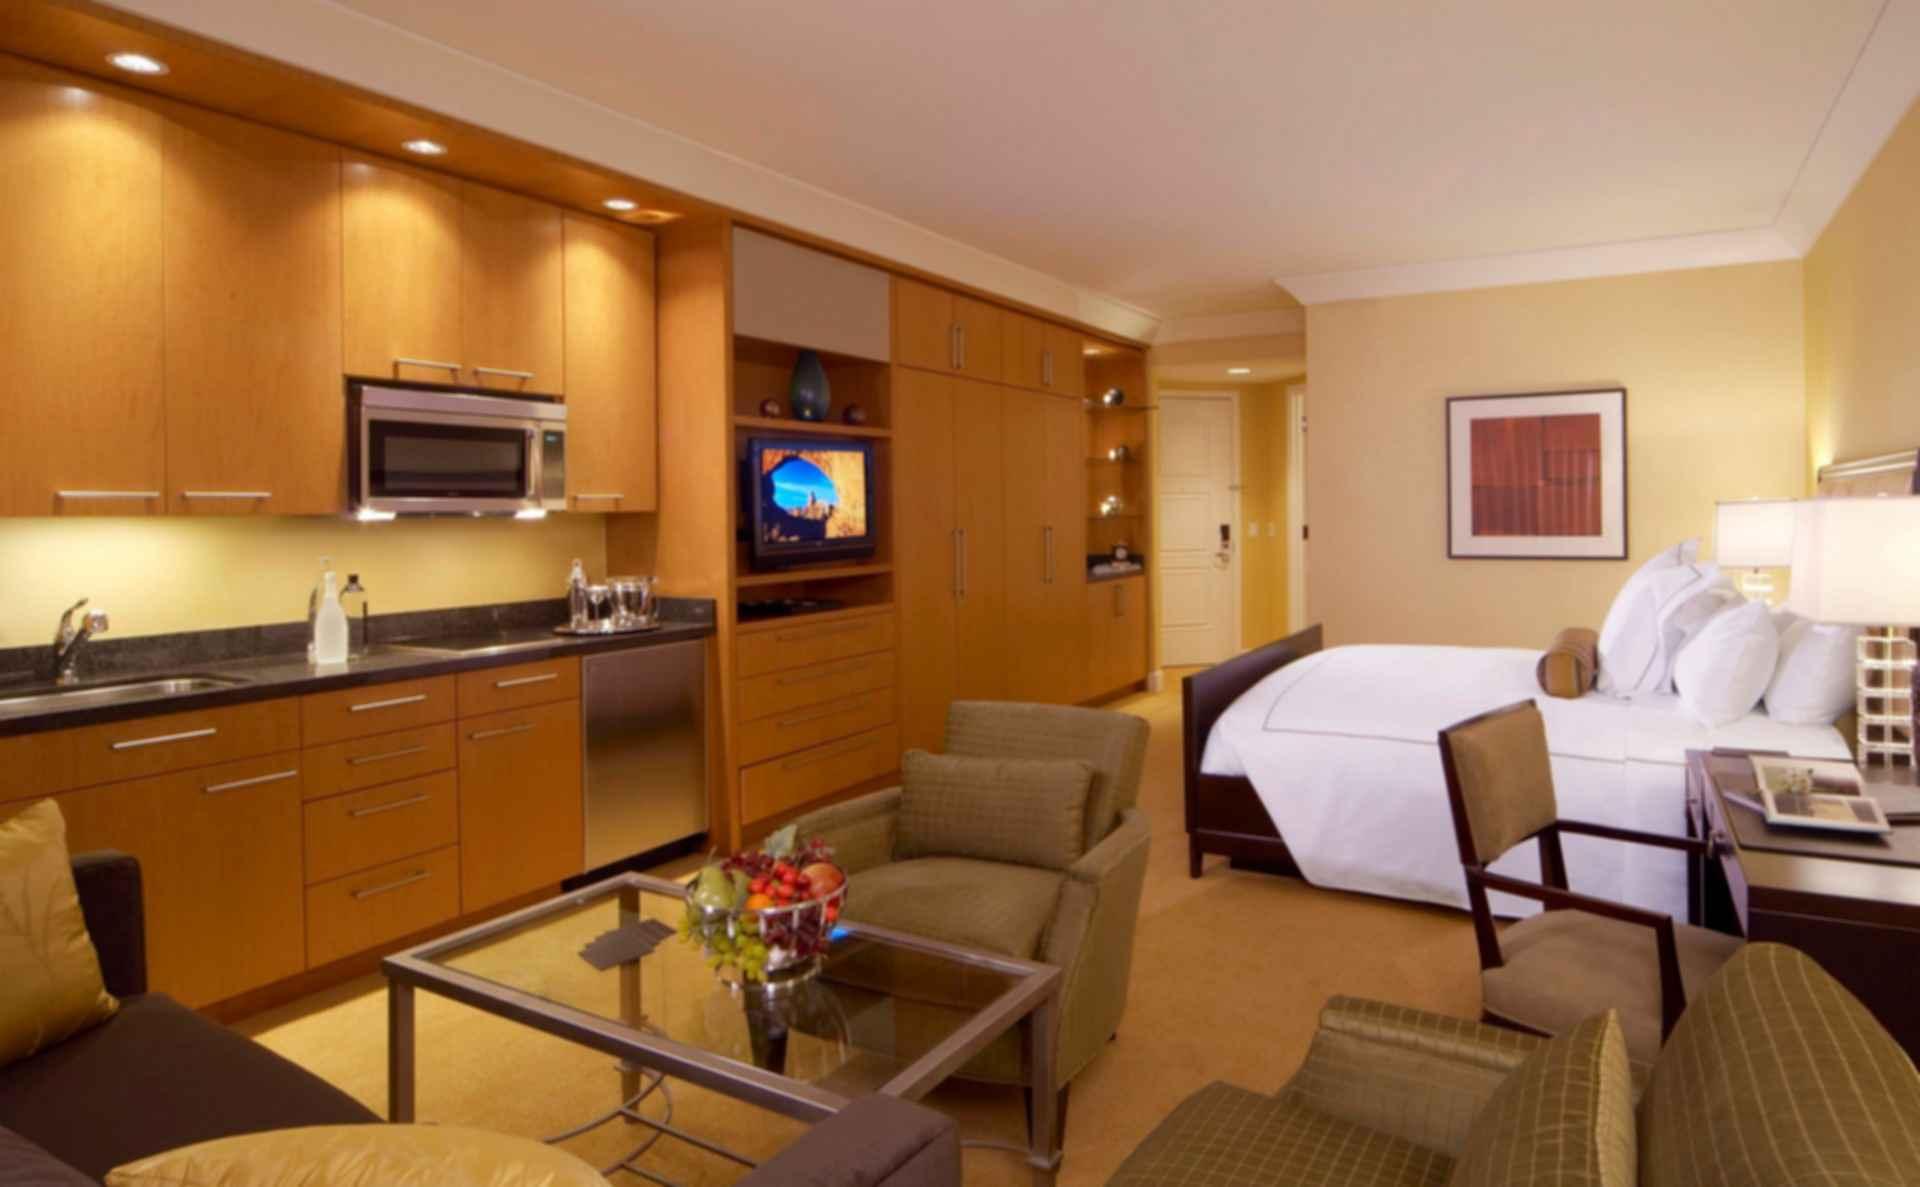 Trump International Hotel, Las Vegas - Hotel Room